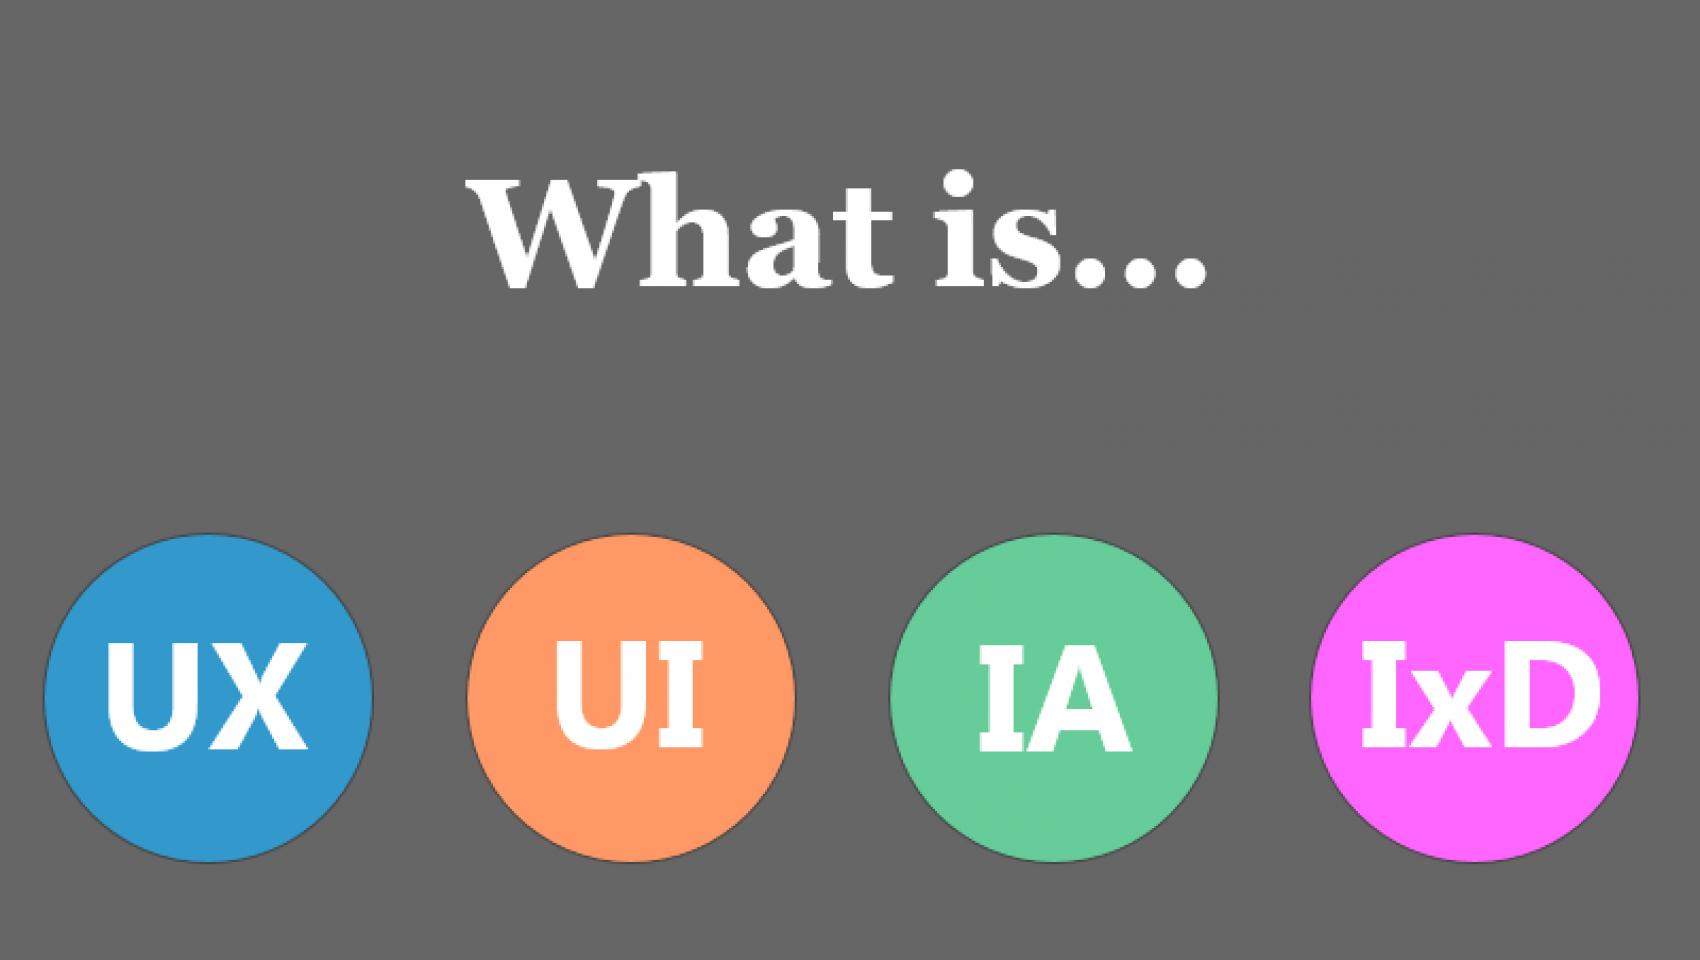 UX vs UI vs IA vs IxD: что означают эти аббревиатуры?